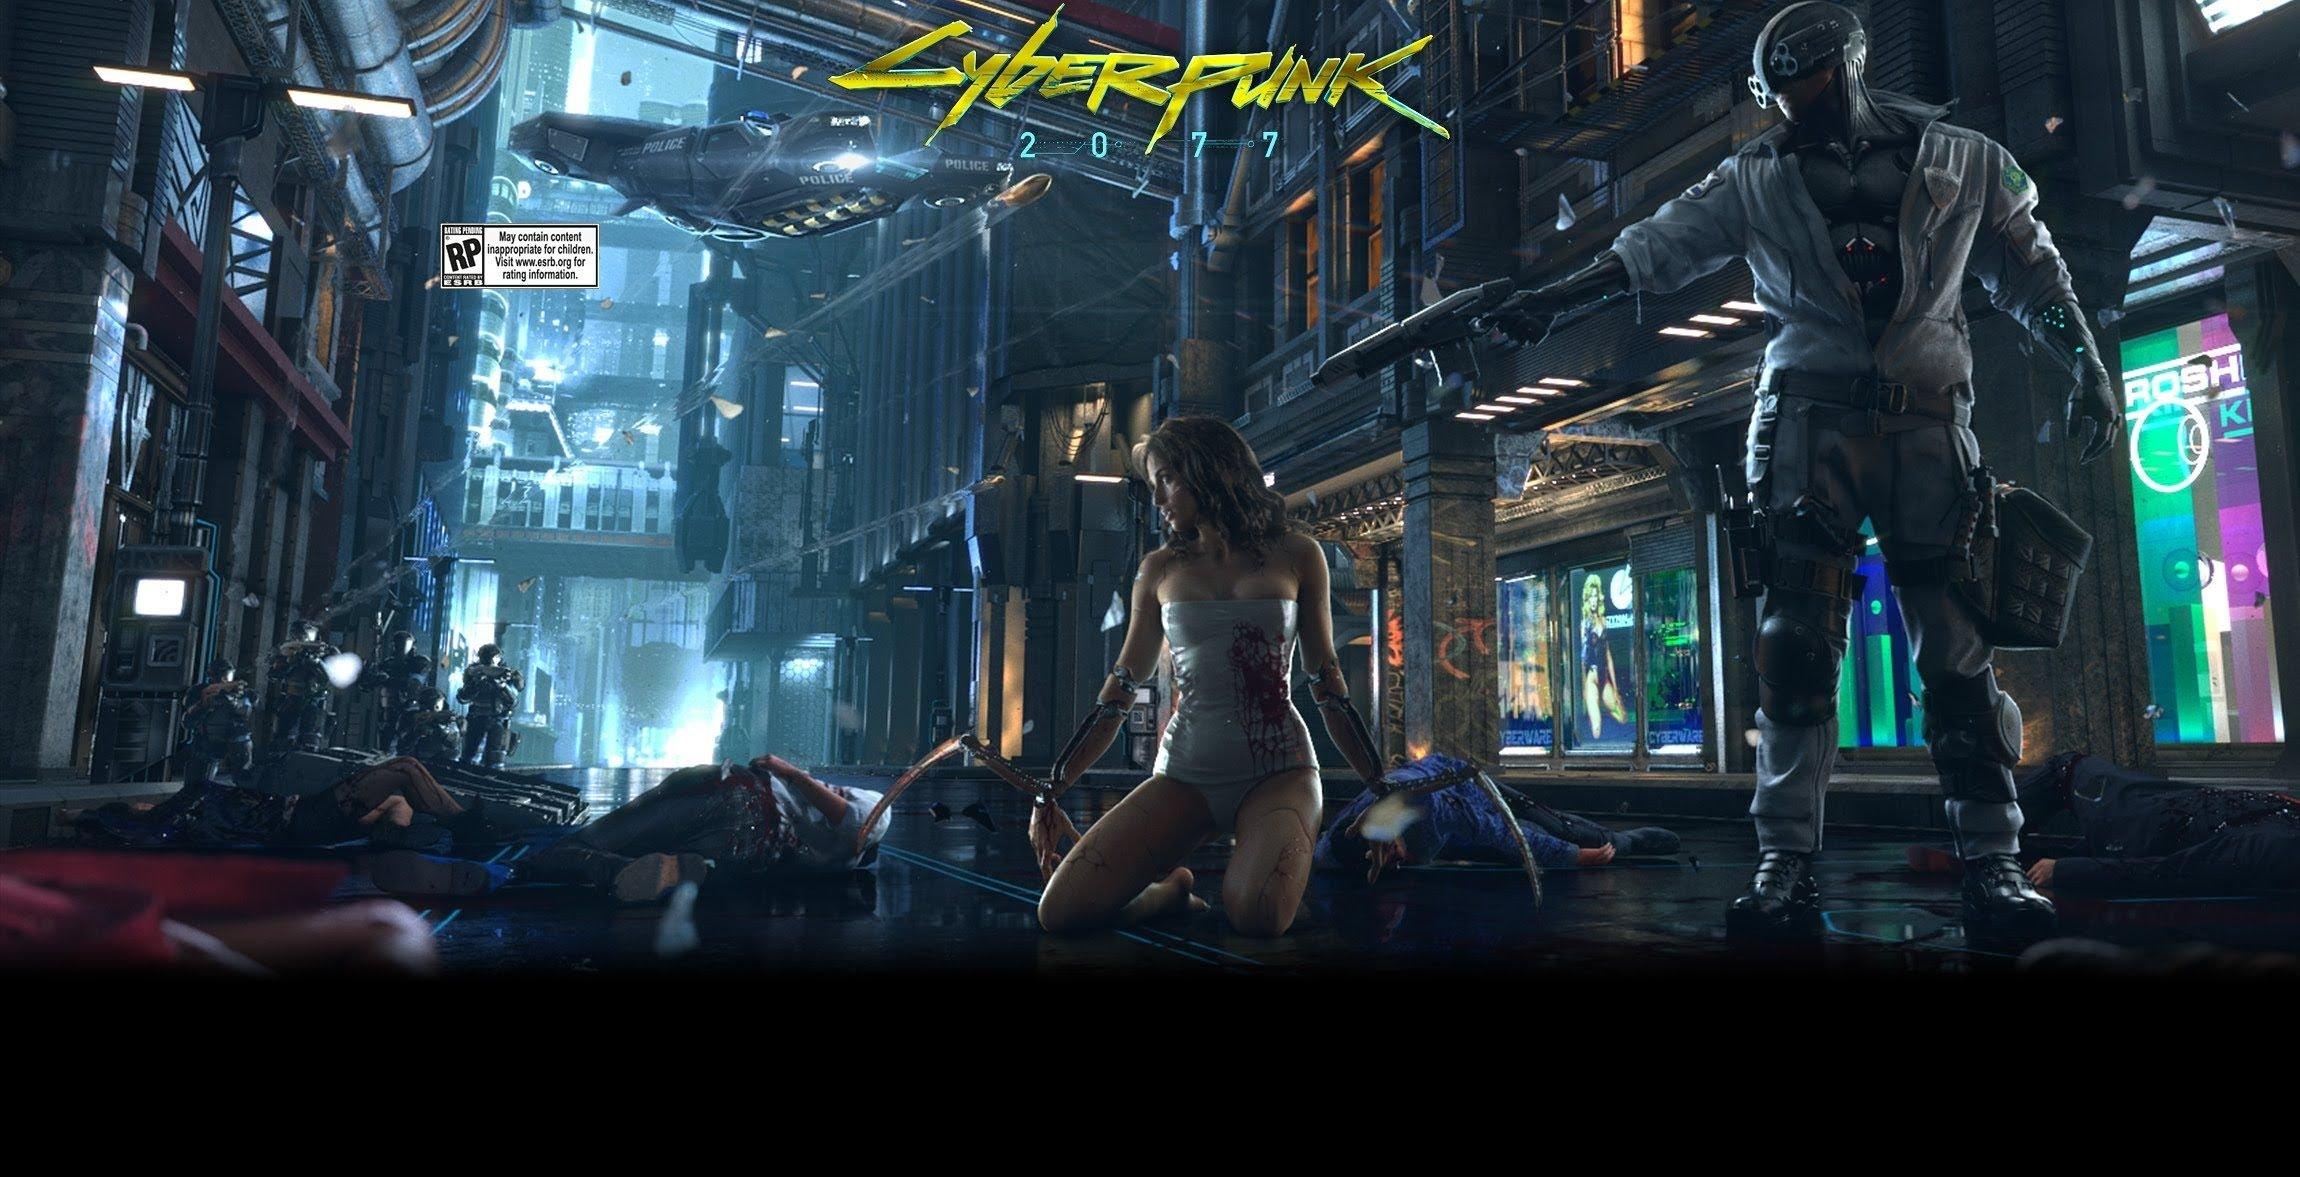 3d 4k Fbb Wallpaper Cyberpunk 2077 Sci Fi Futuristic Action Fighting Rpg